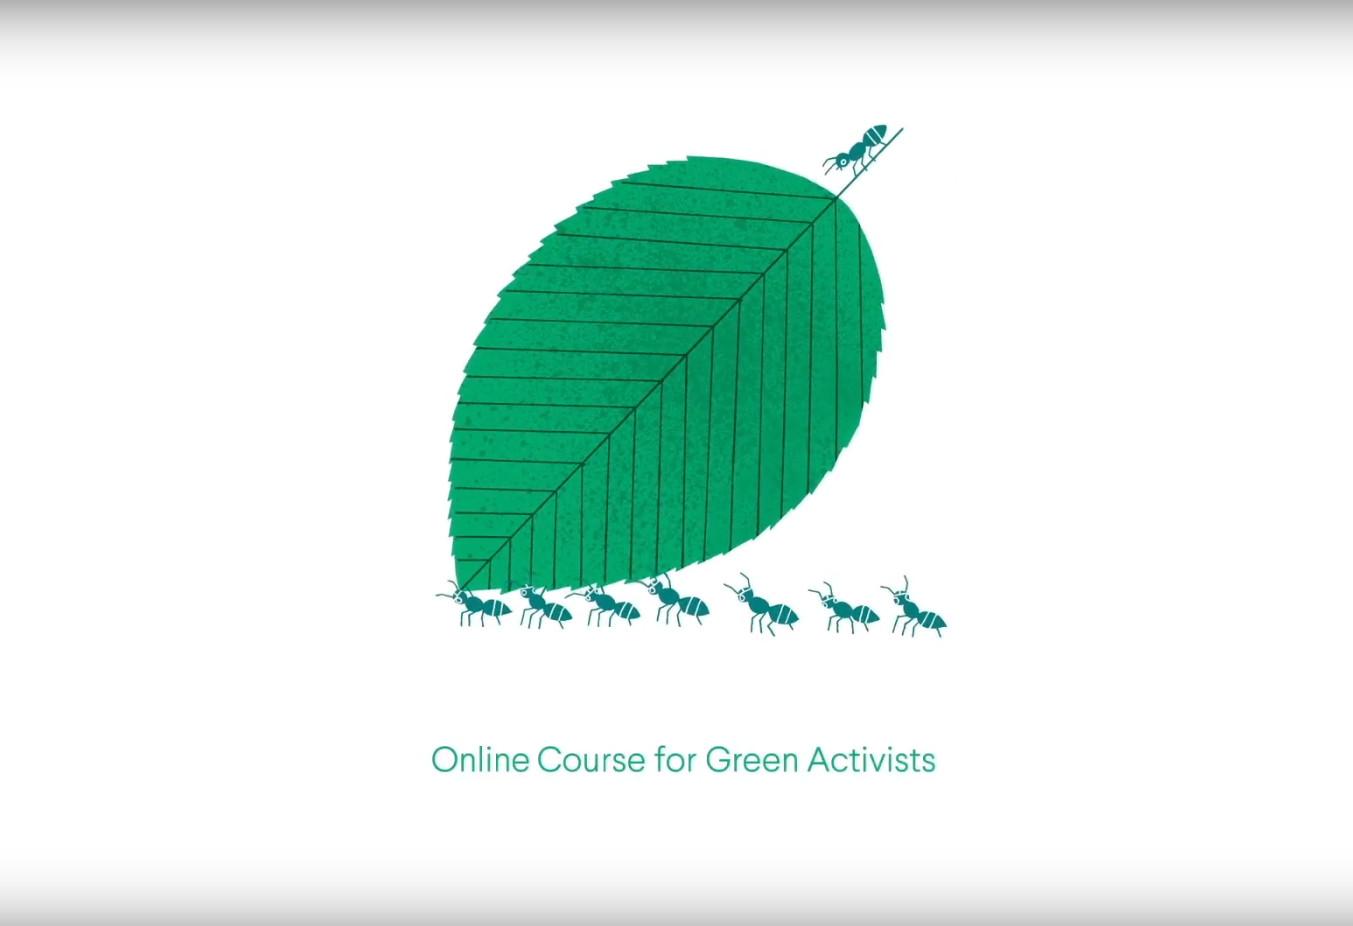 Impact Europe. Curso online para activistas verdes